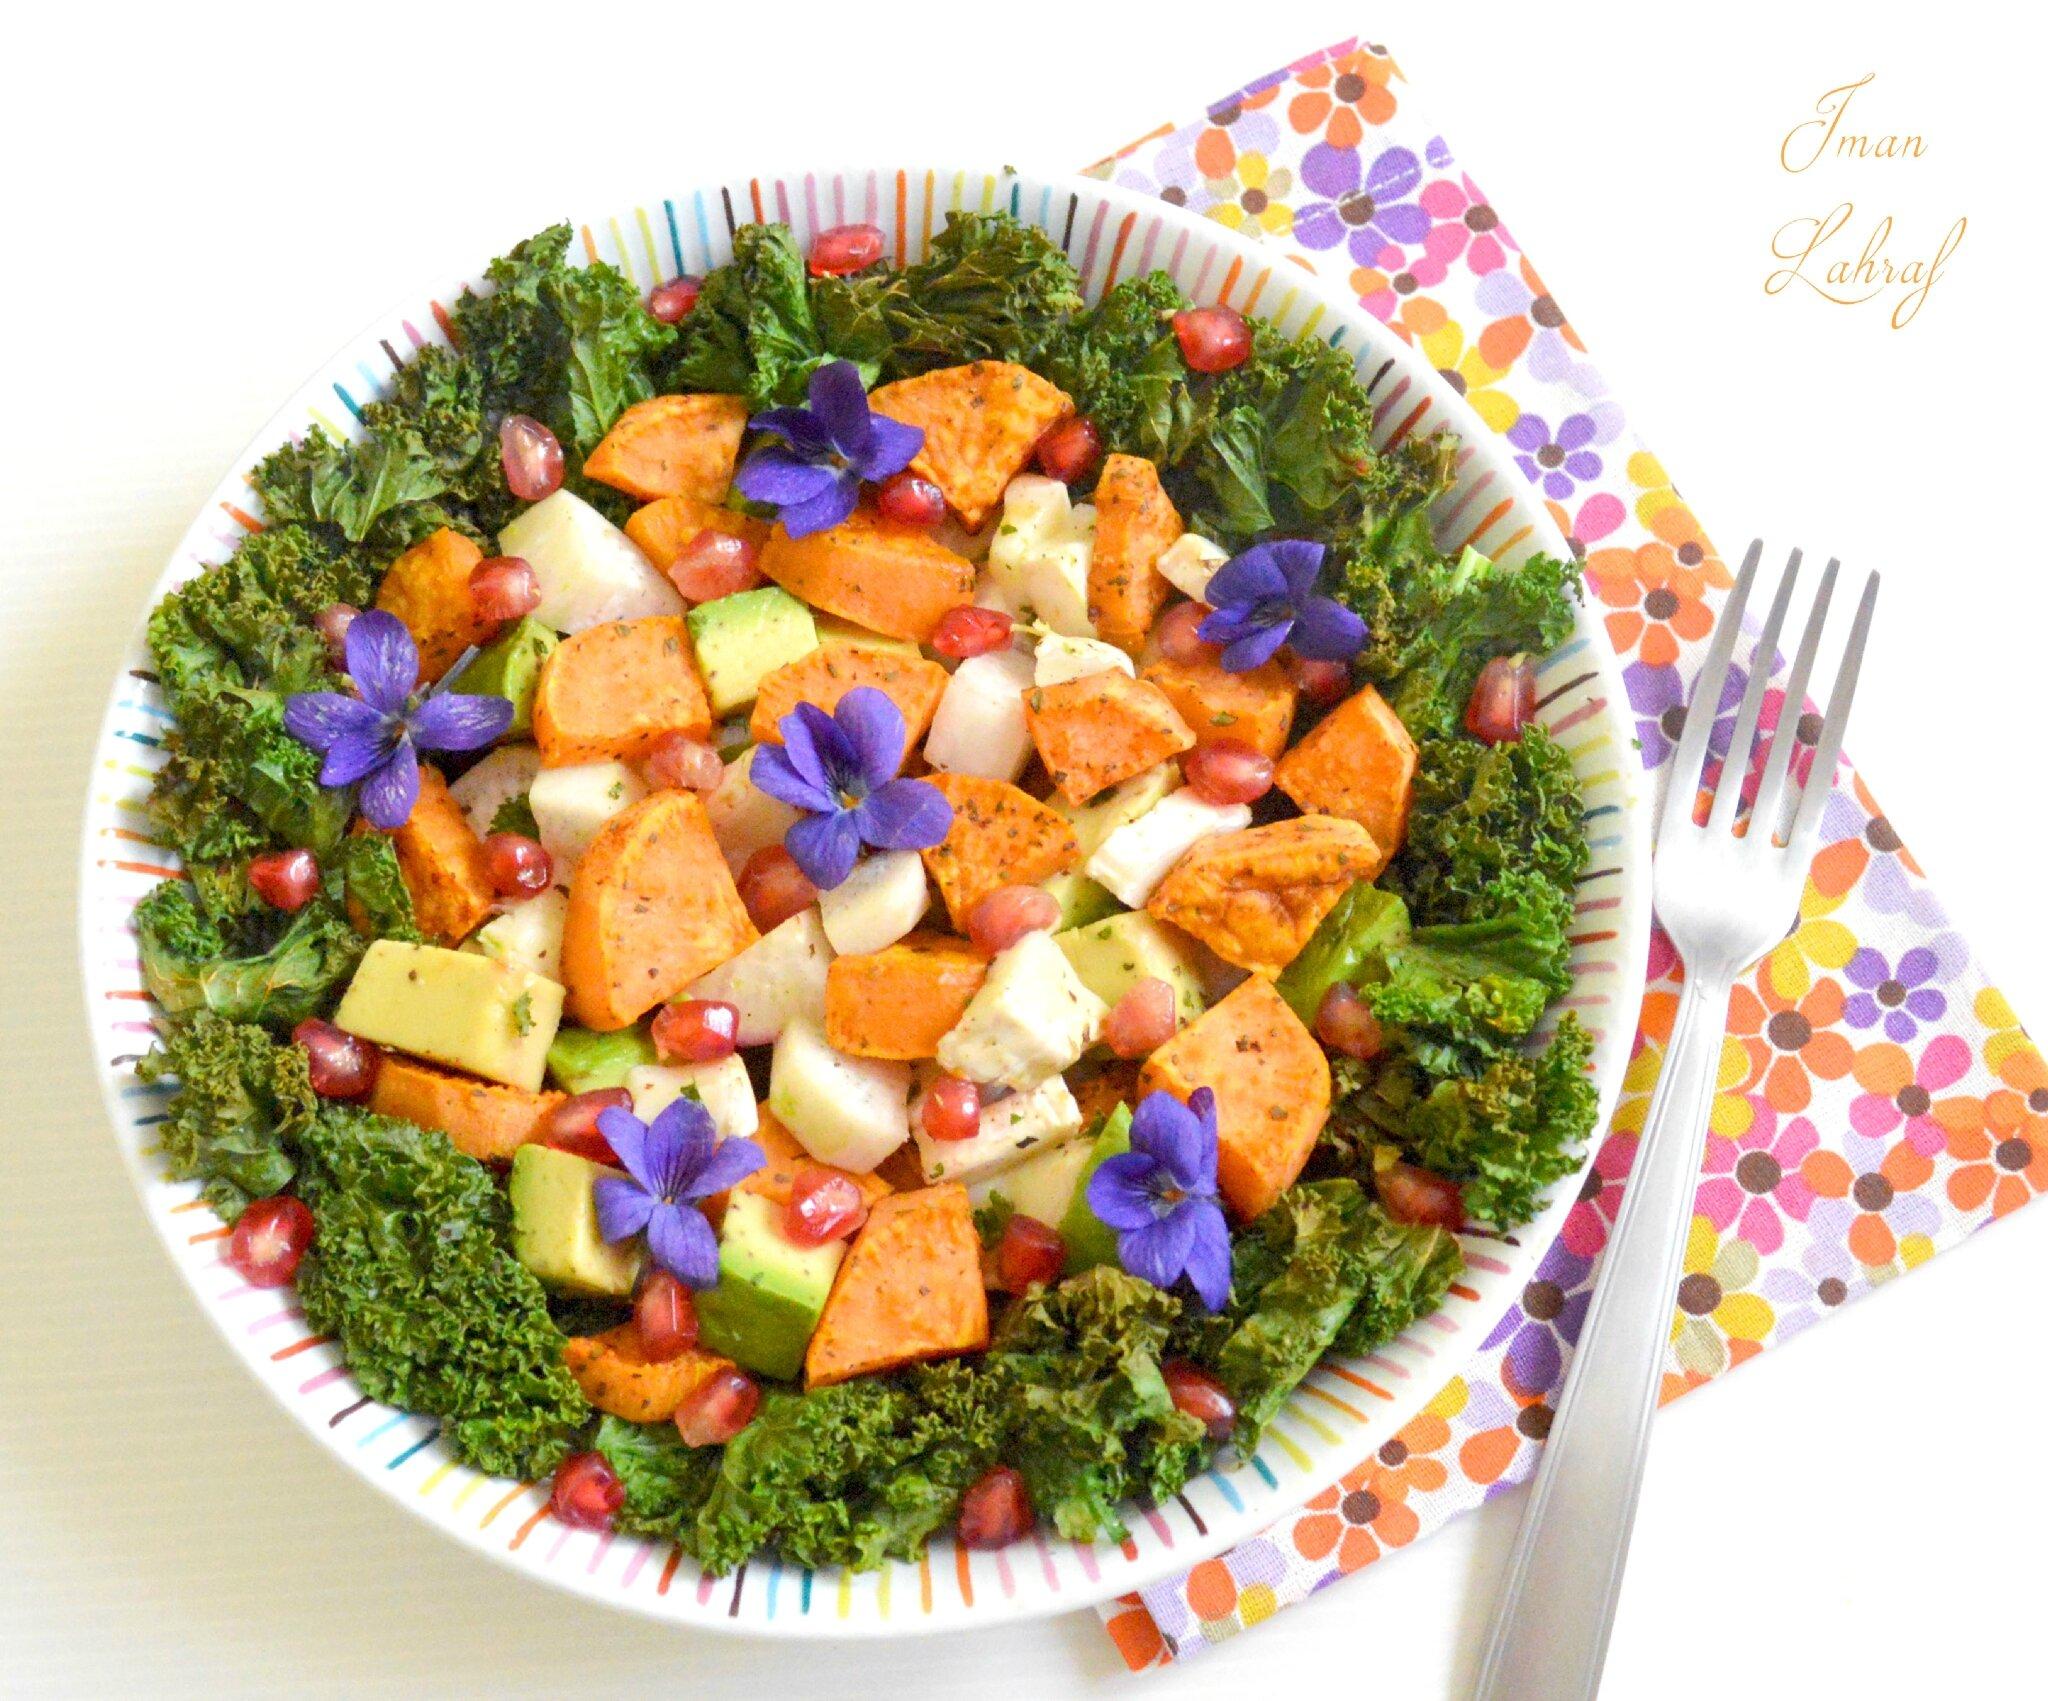 Salade sucrée-salée, colorée & vitaminée